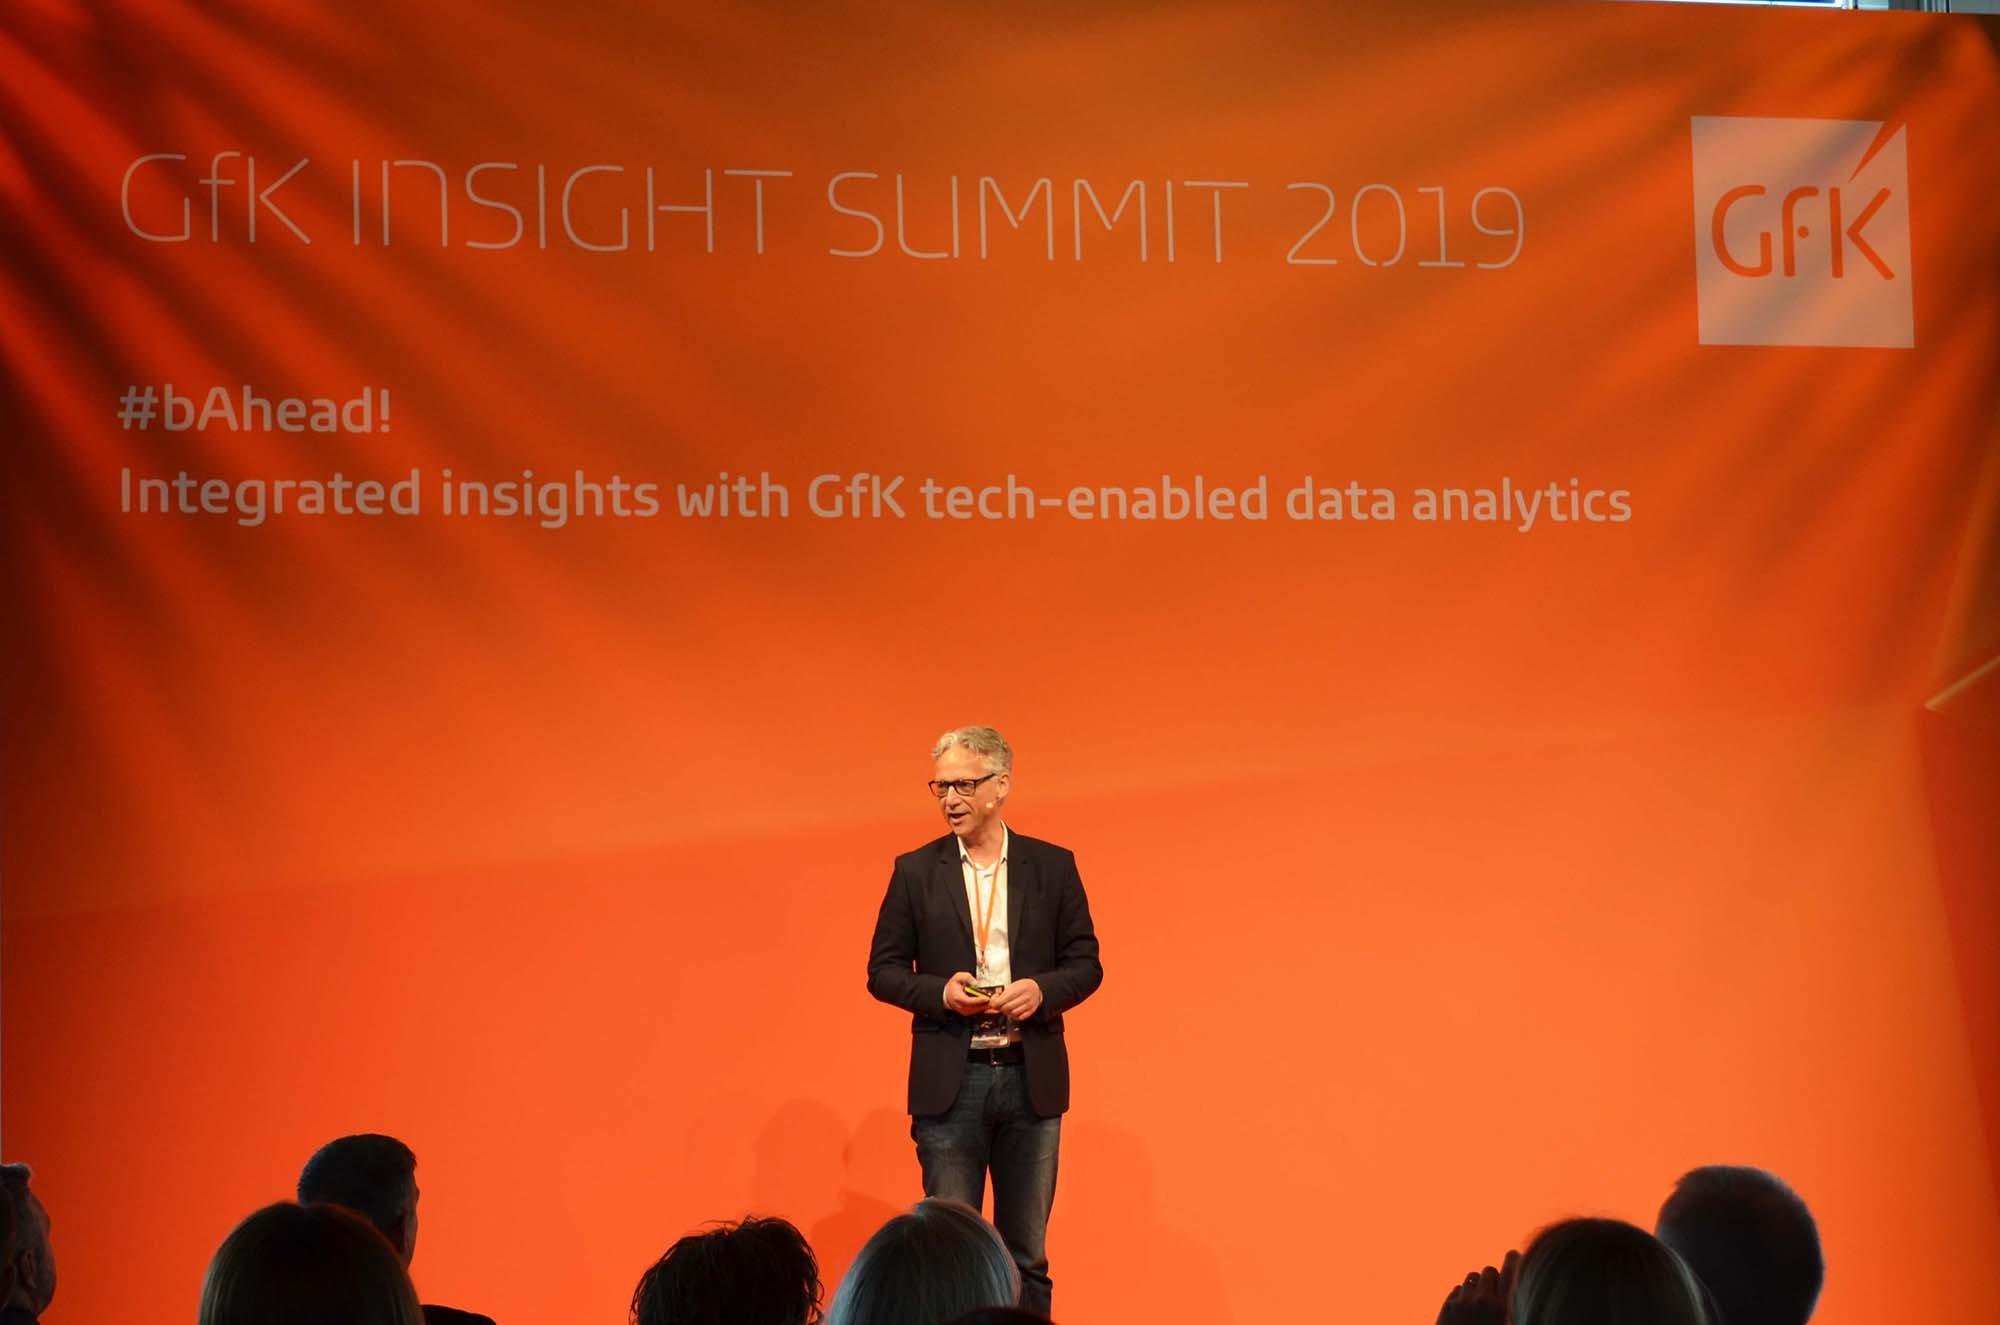 GfK Insight Summit 2019